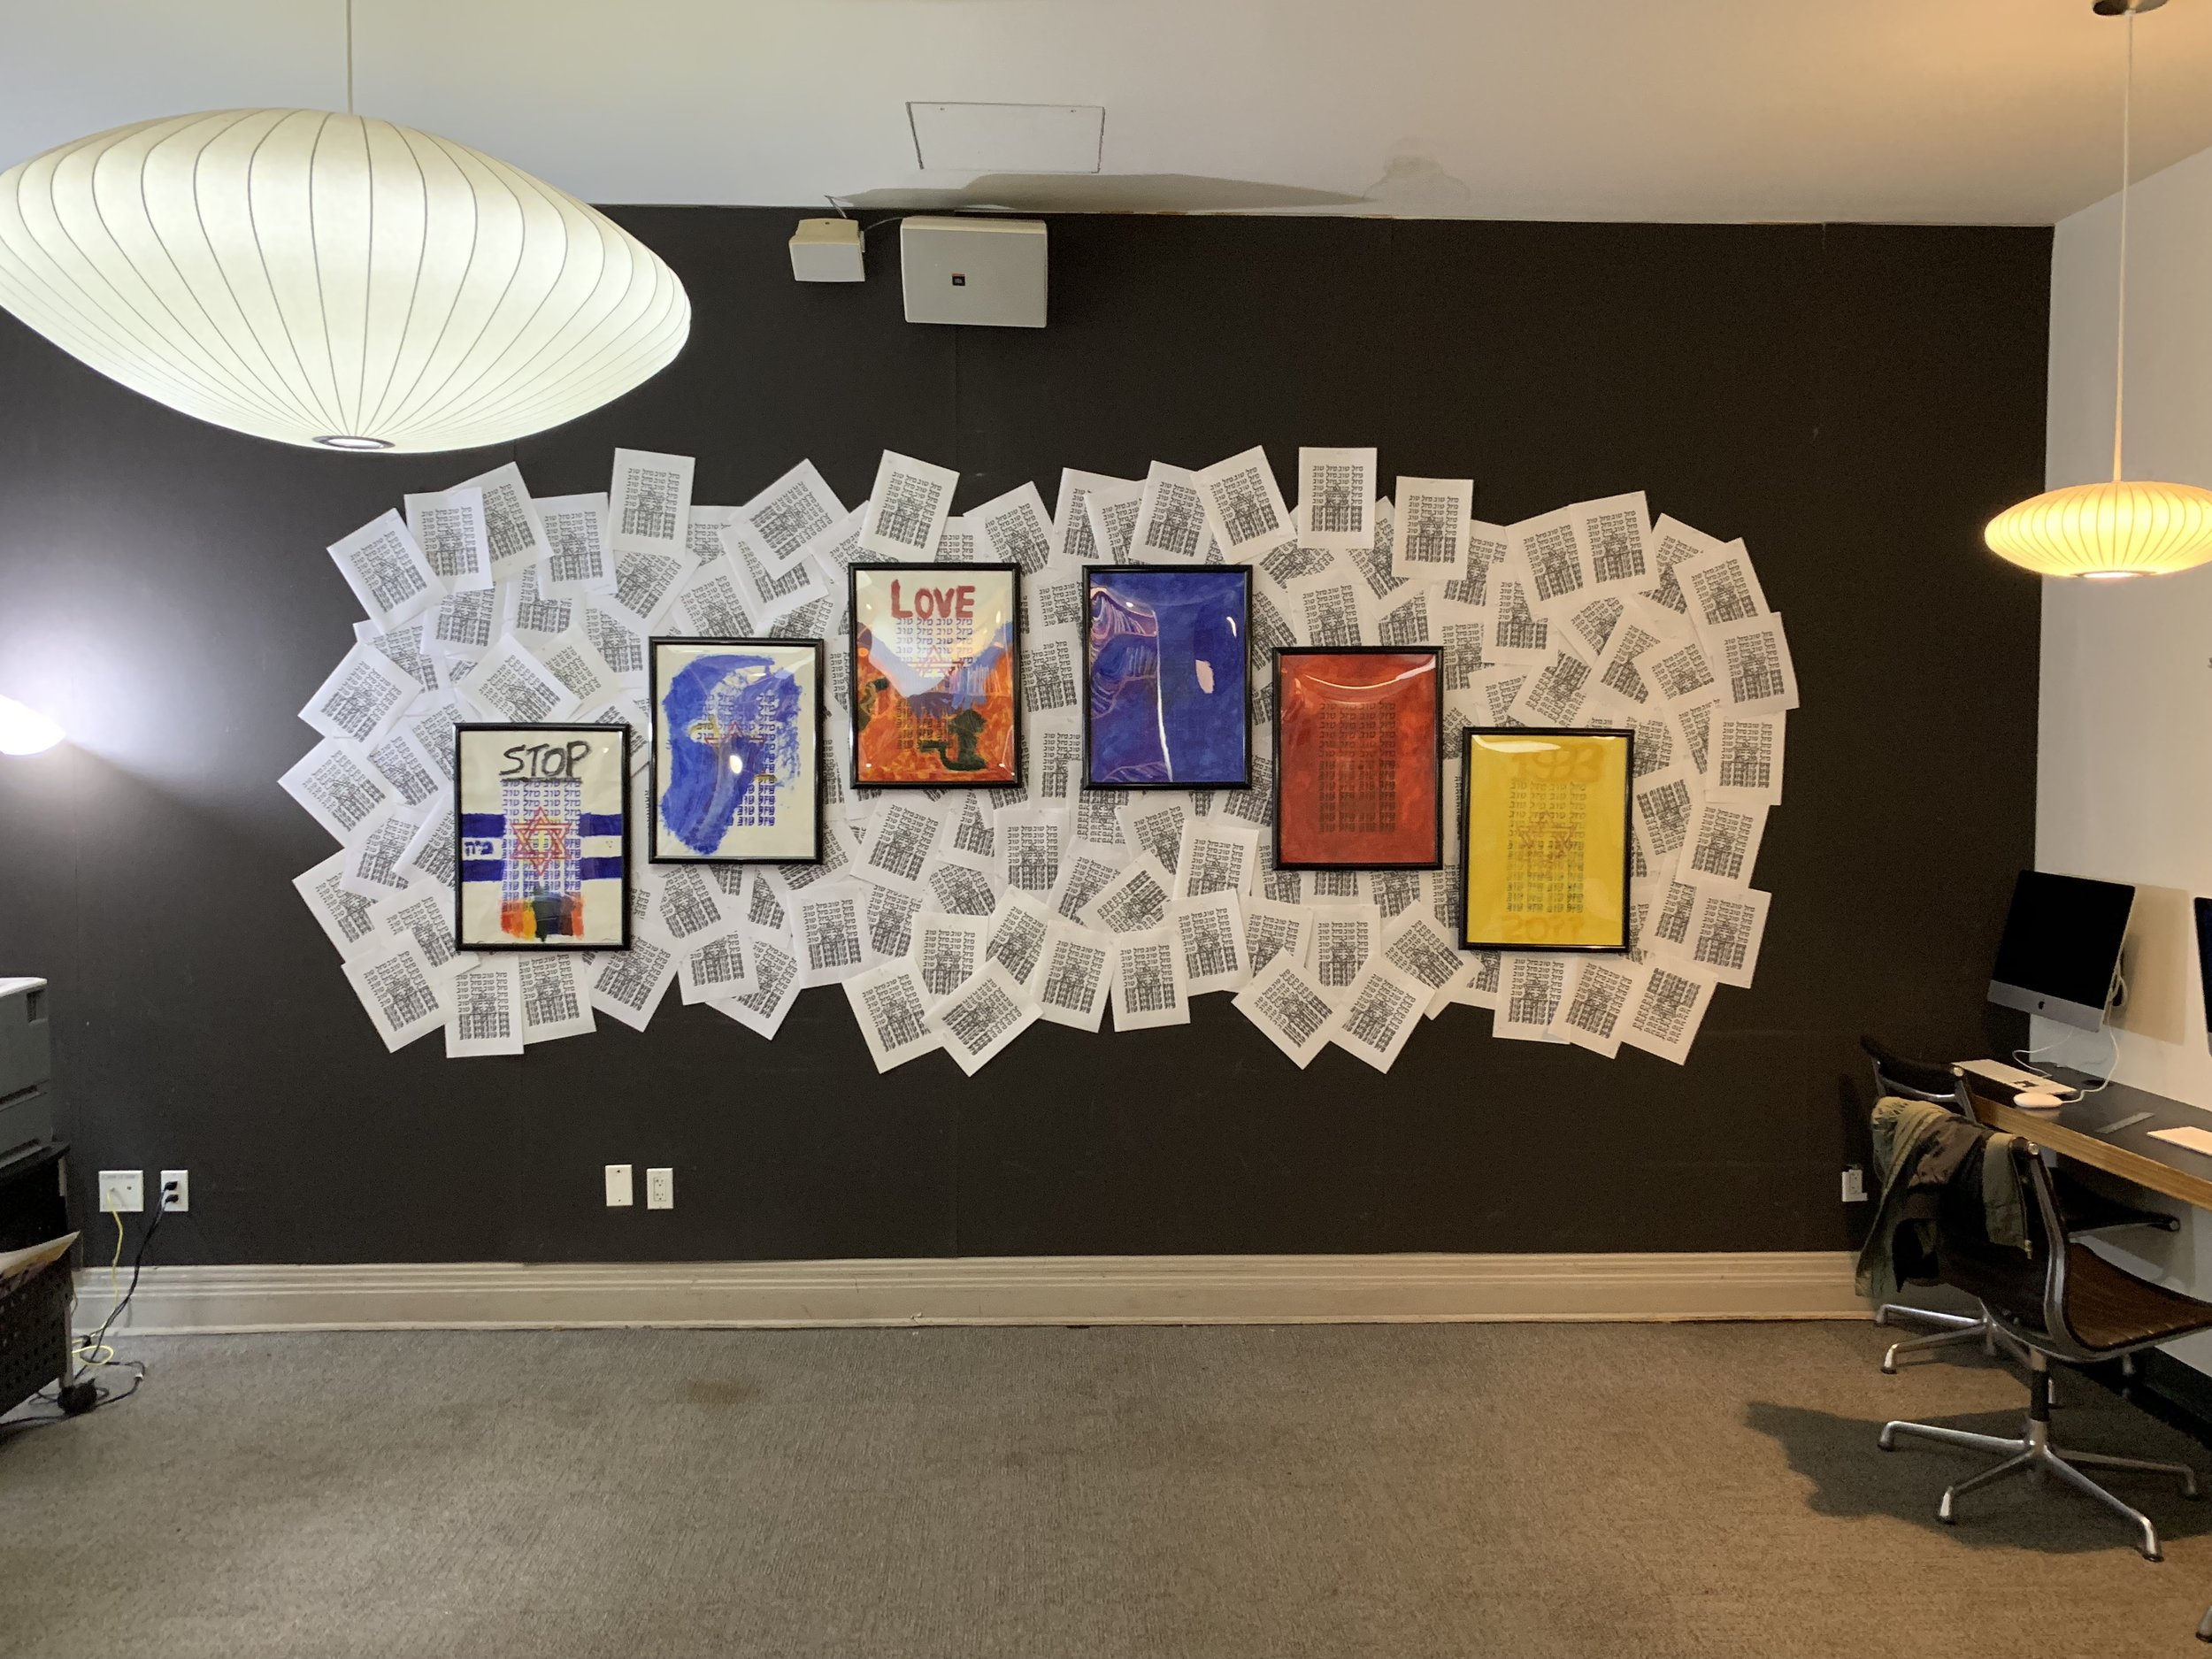 """180 SWASTIKAS"" installation at Macaulay Arts Night 2019 (March 30, 2019). Macaulay Honors College, Manhattan, NY."